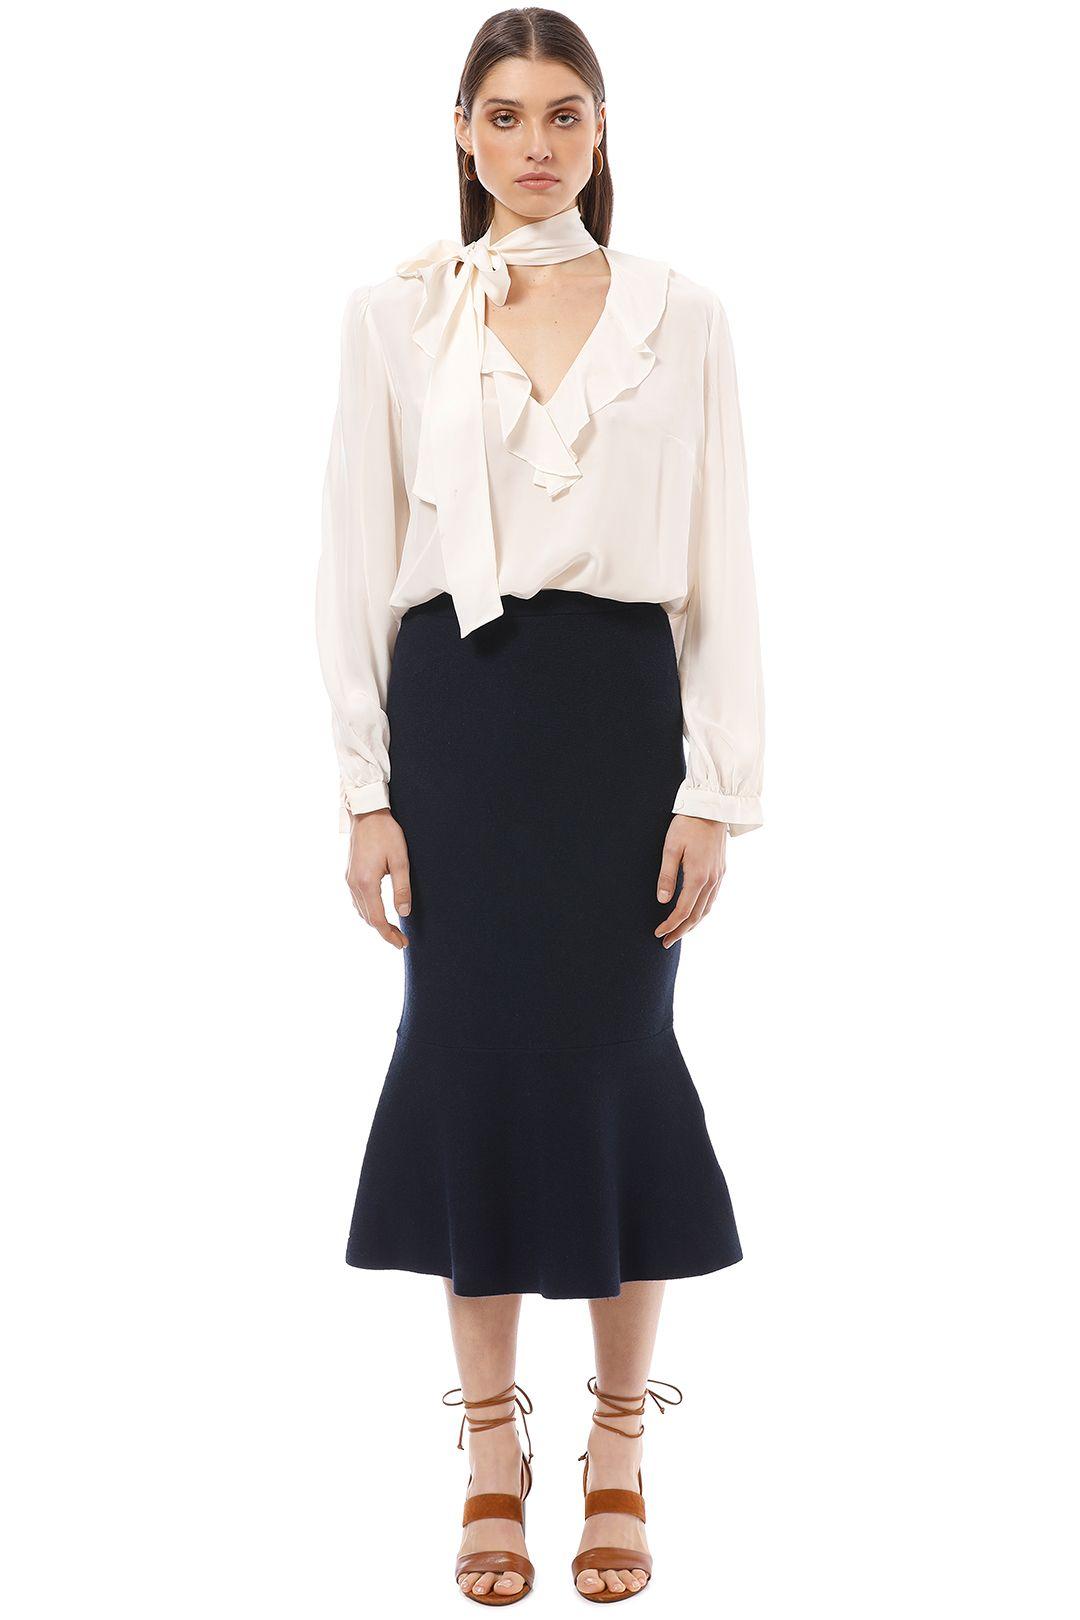 Friend of Audrey - Eleanor Midi Skirt - Navy - Front